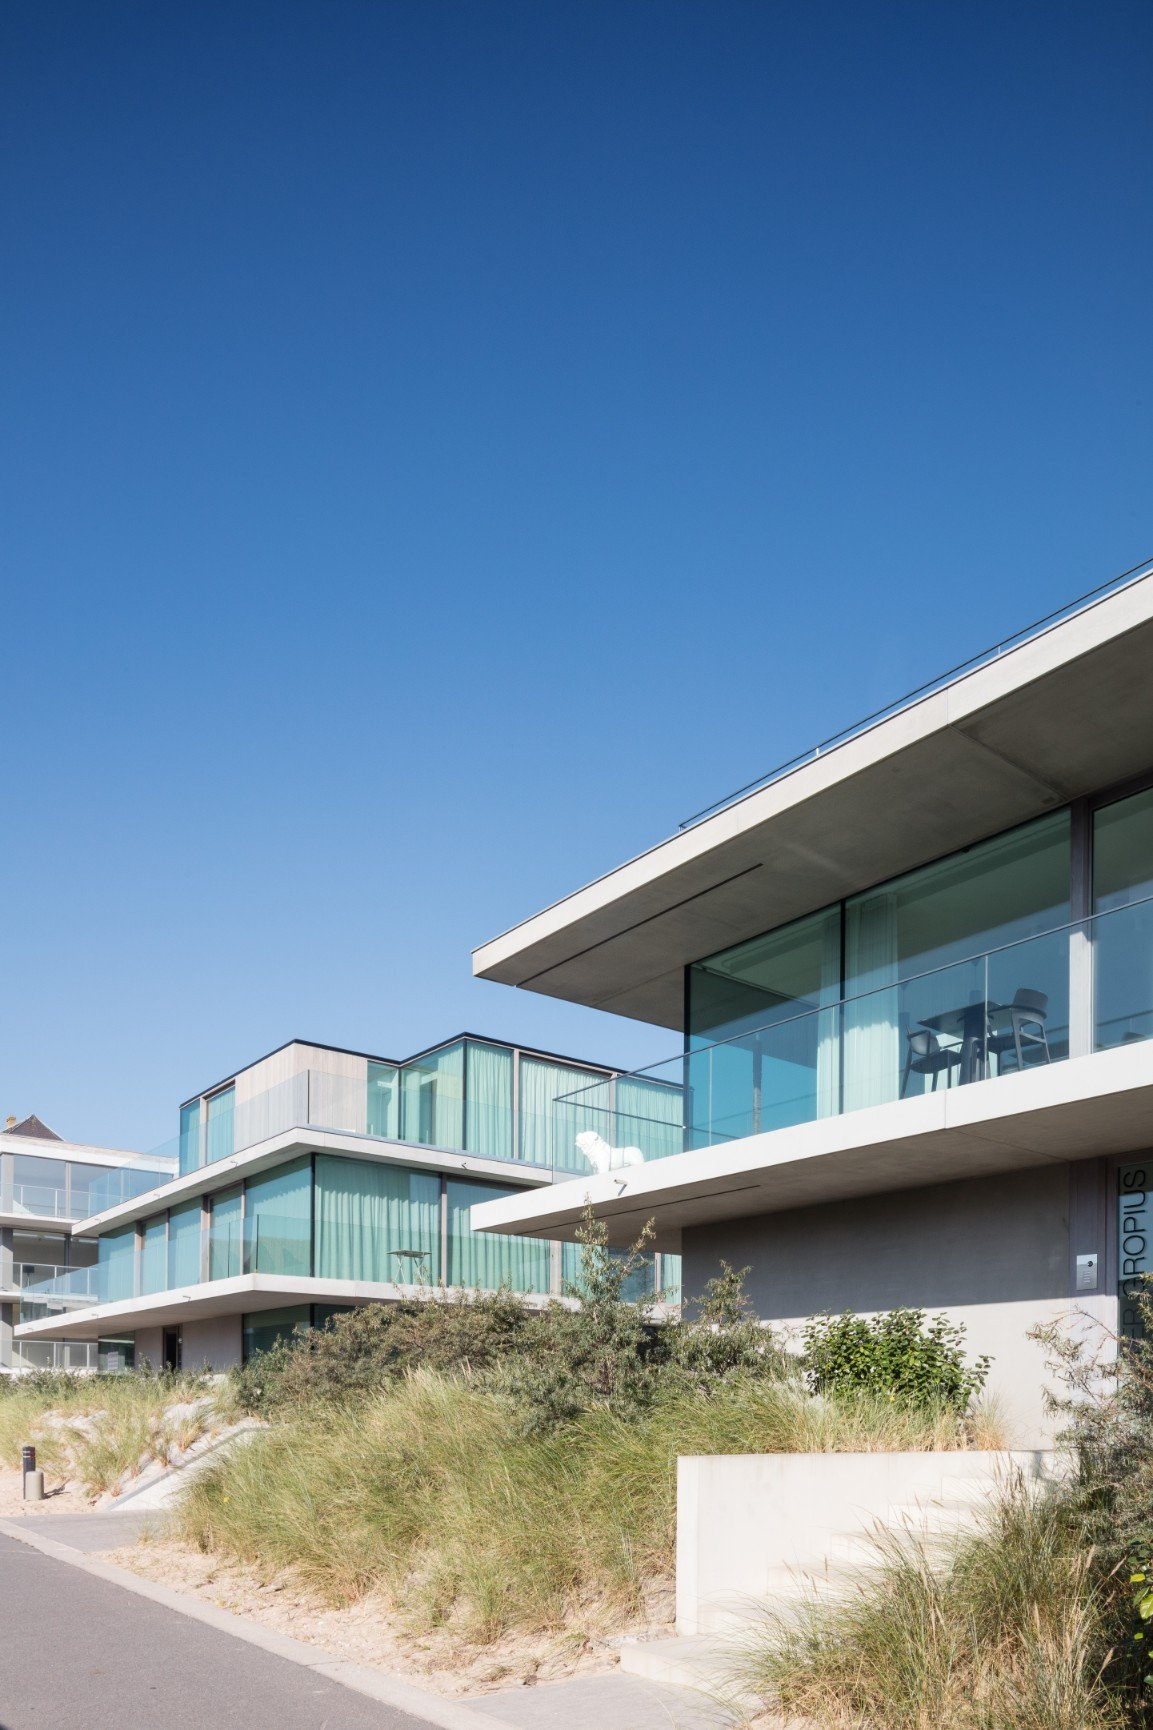 Rietveldprojects.be-Twins-Gropius-Breuer-appartement-design-architectuur-kust11.jpg